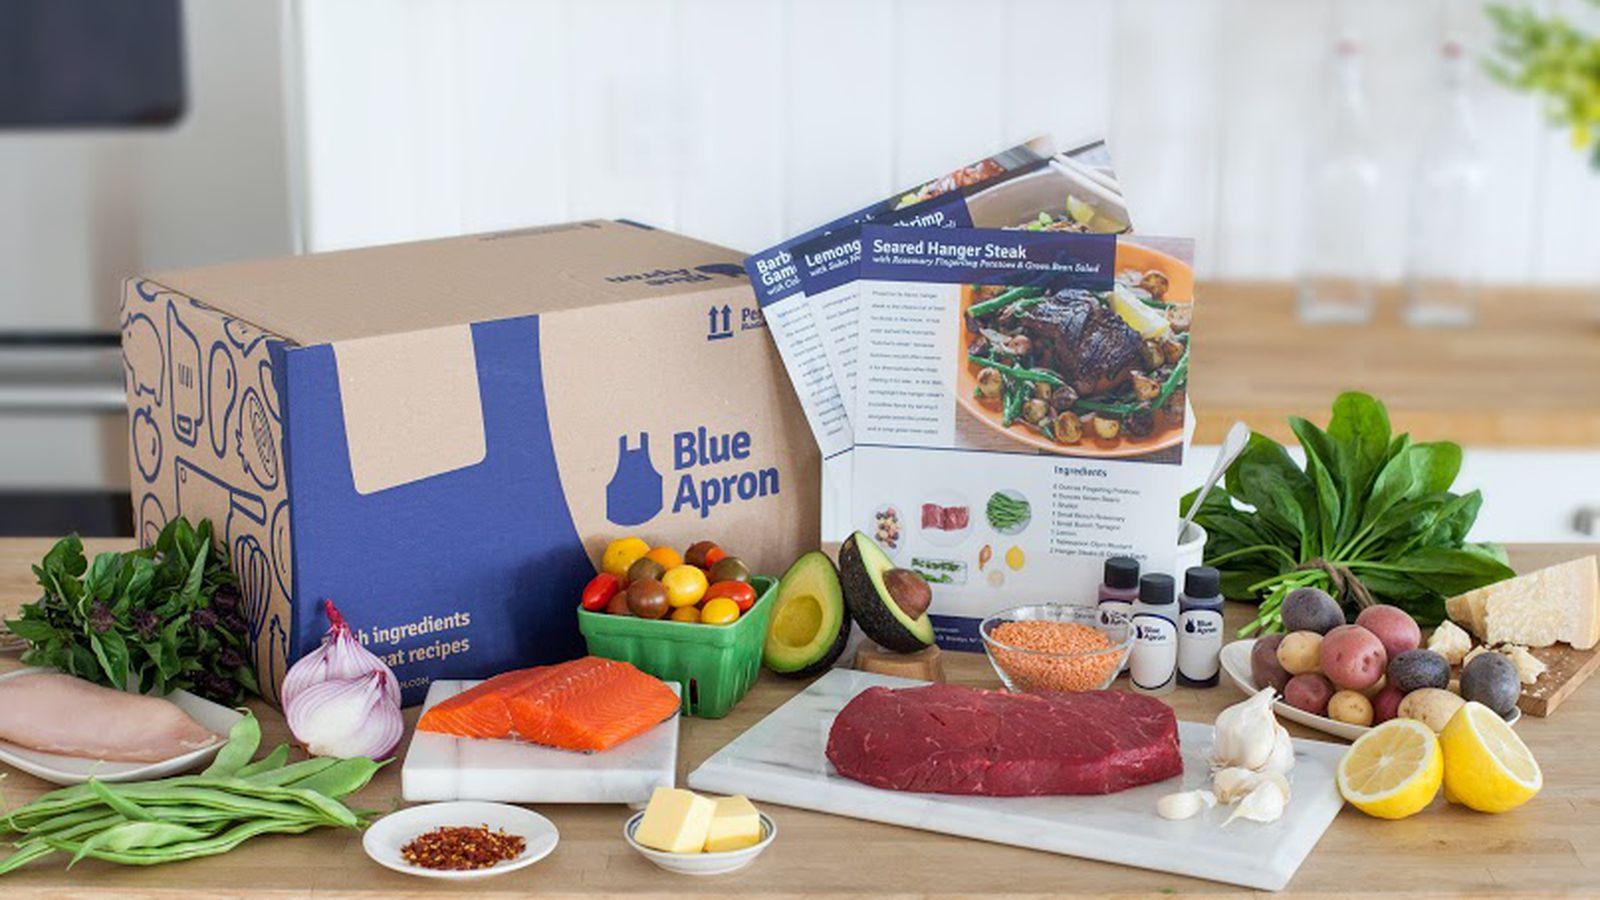 Blue apron australia - Blue Apron Australia 54